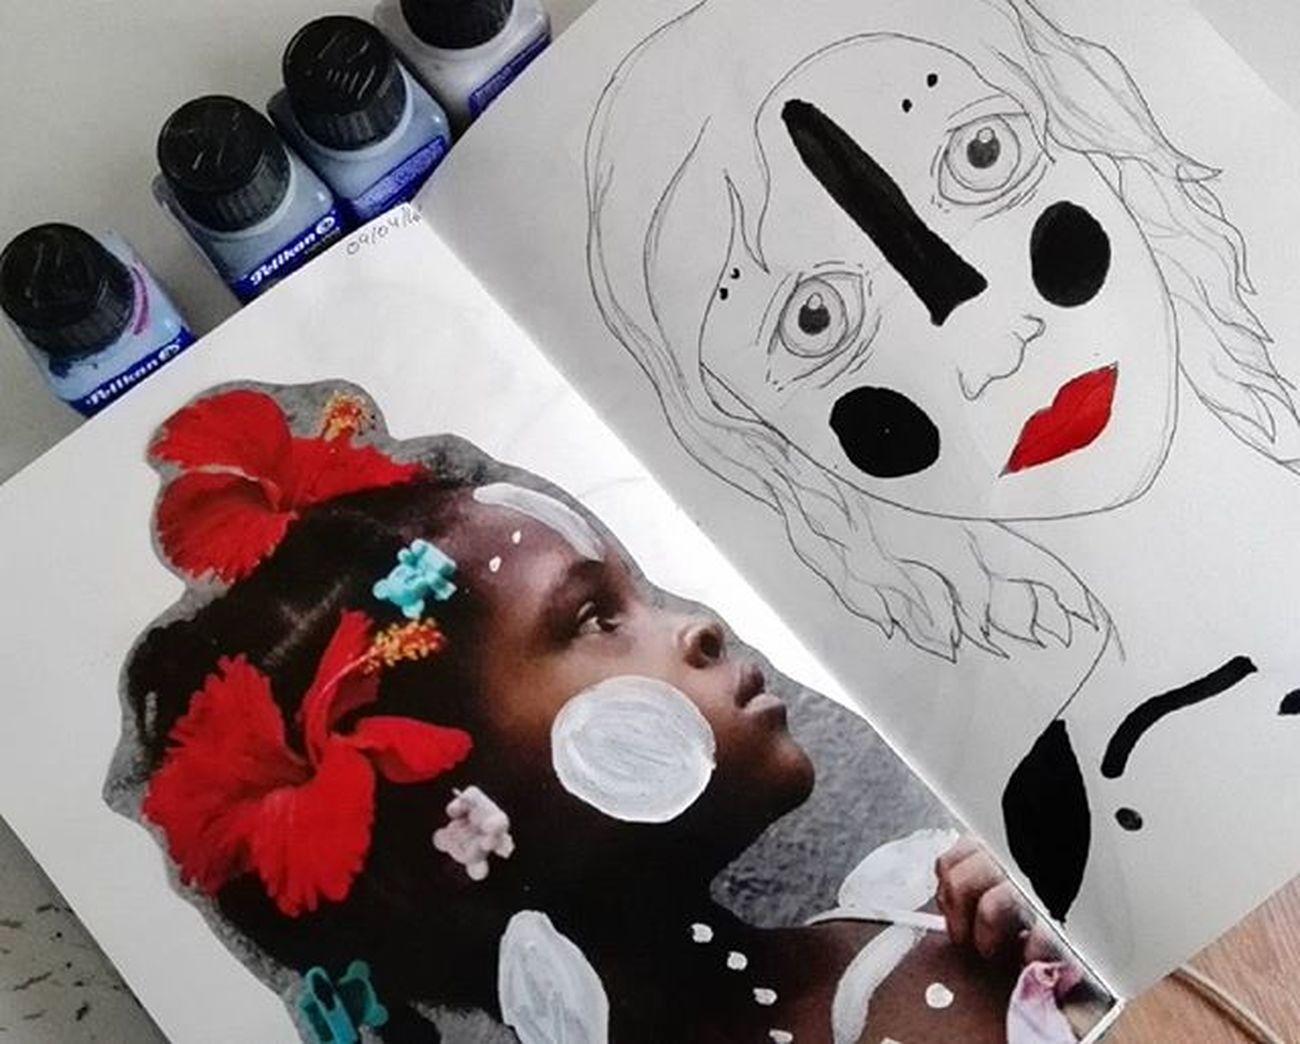 Mezclando culturas Art Sketchbook Sketchaday Colombianart Colombia Drawing Afroculture Portrait Draw